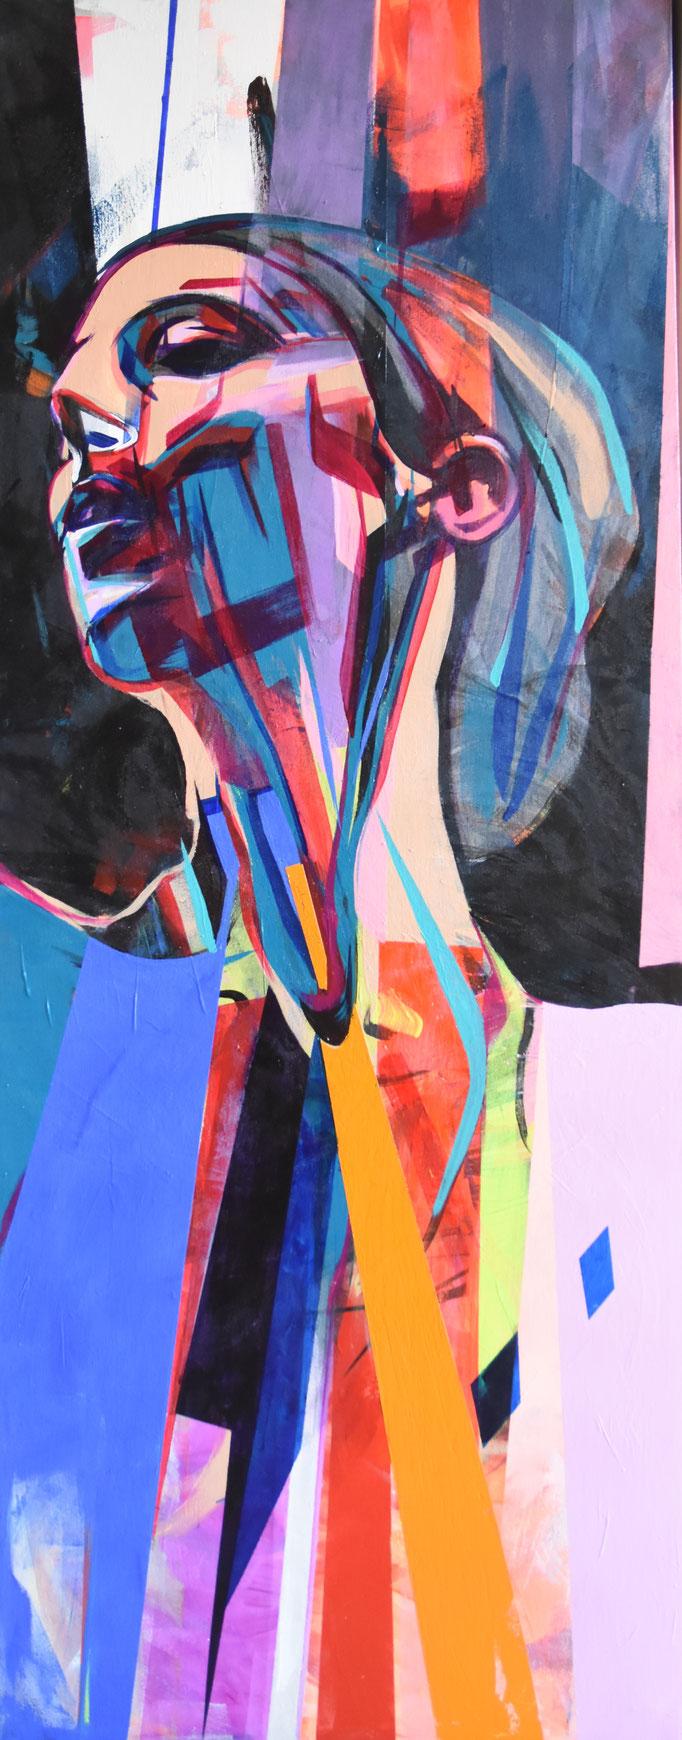 REFLEX, 2017, Acrylic on canvas, 64cm x 164cm